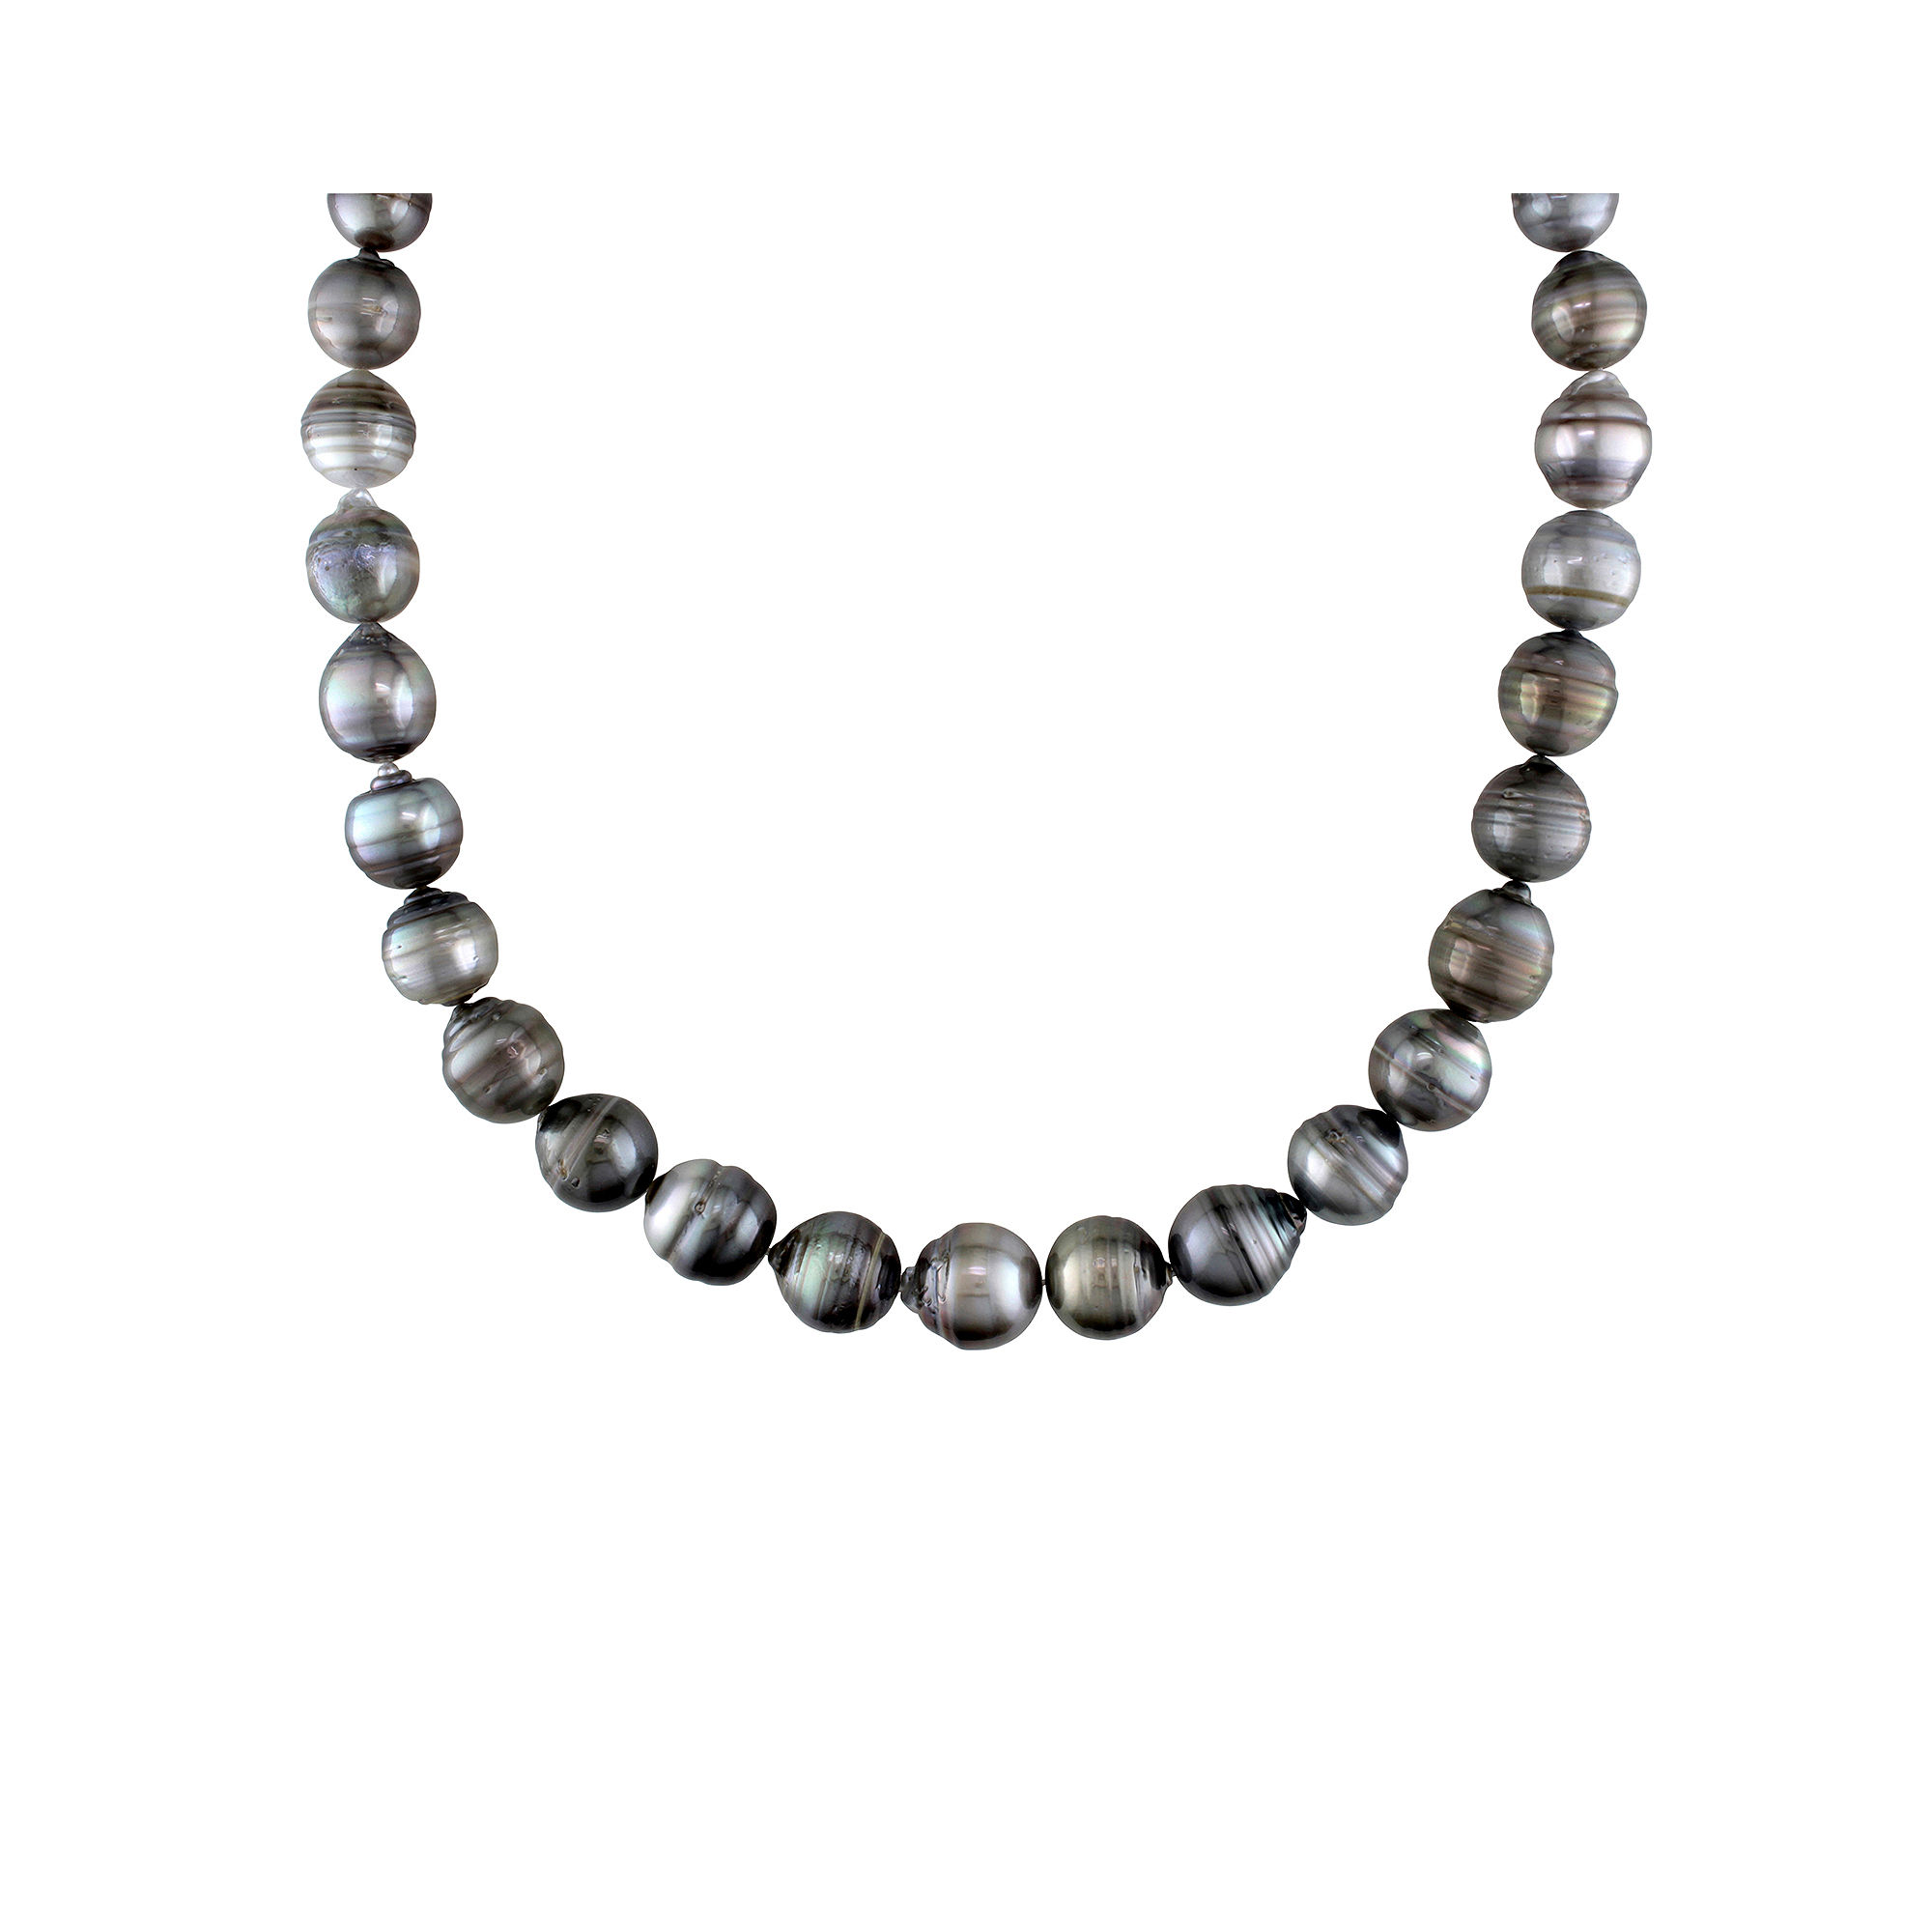 9-12mm Genuine Black Tahitian Pearl Necklace